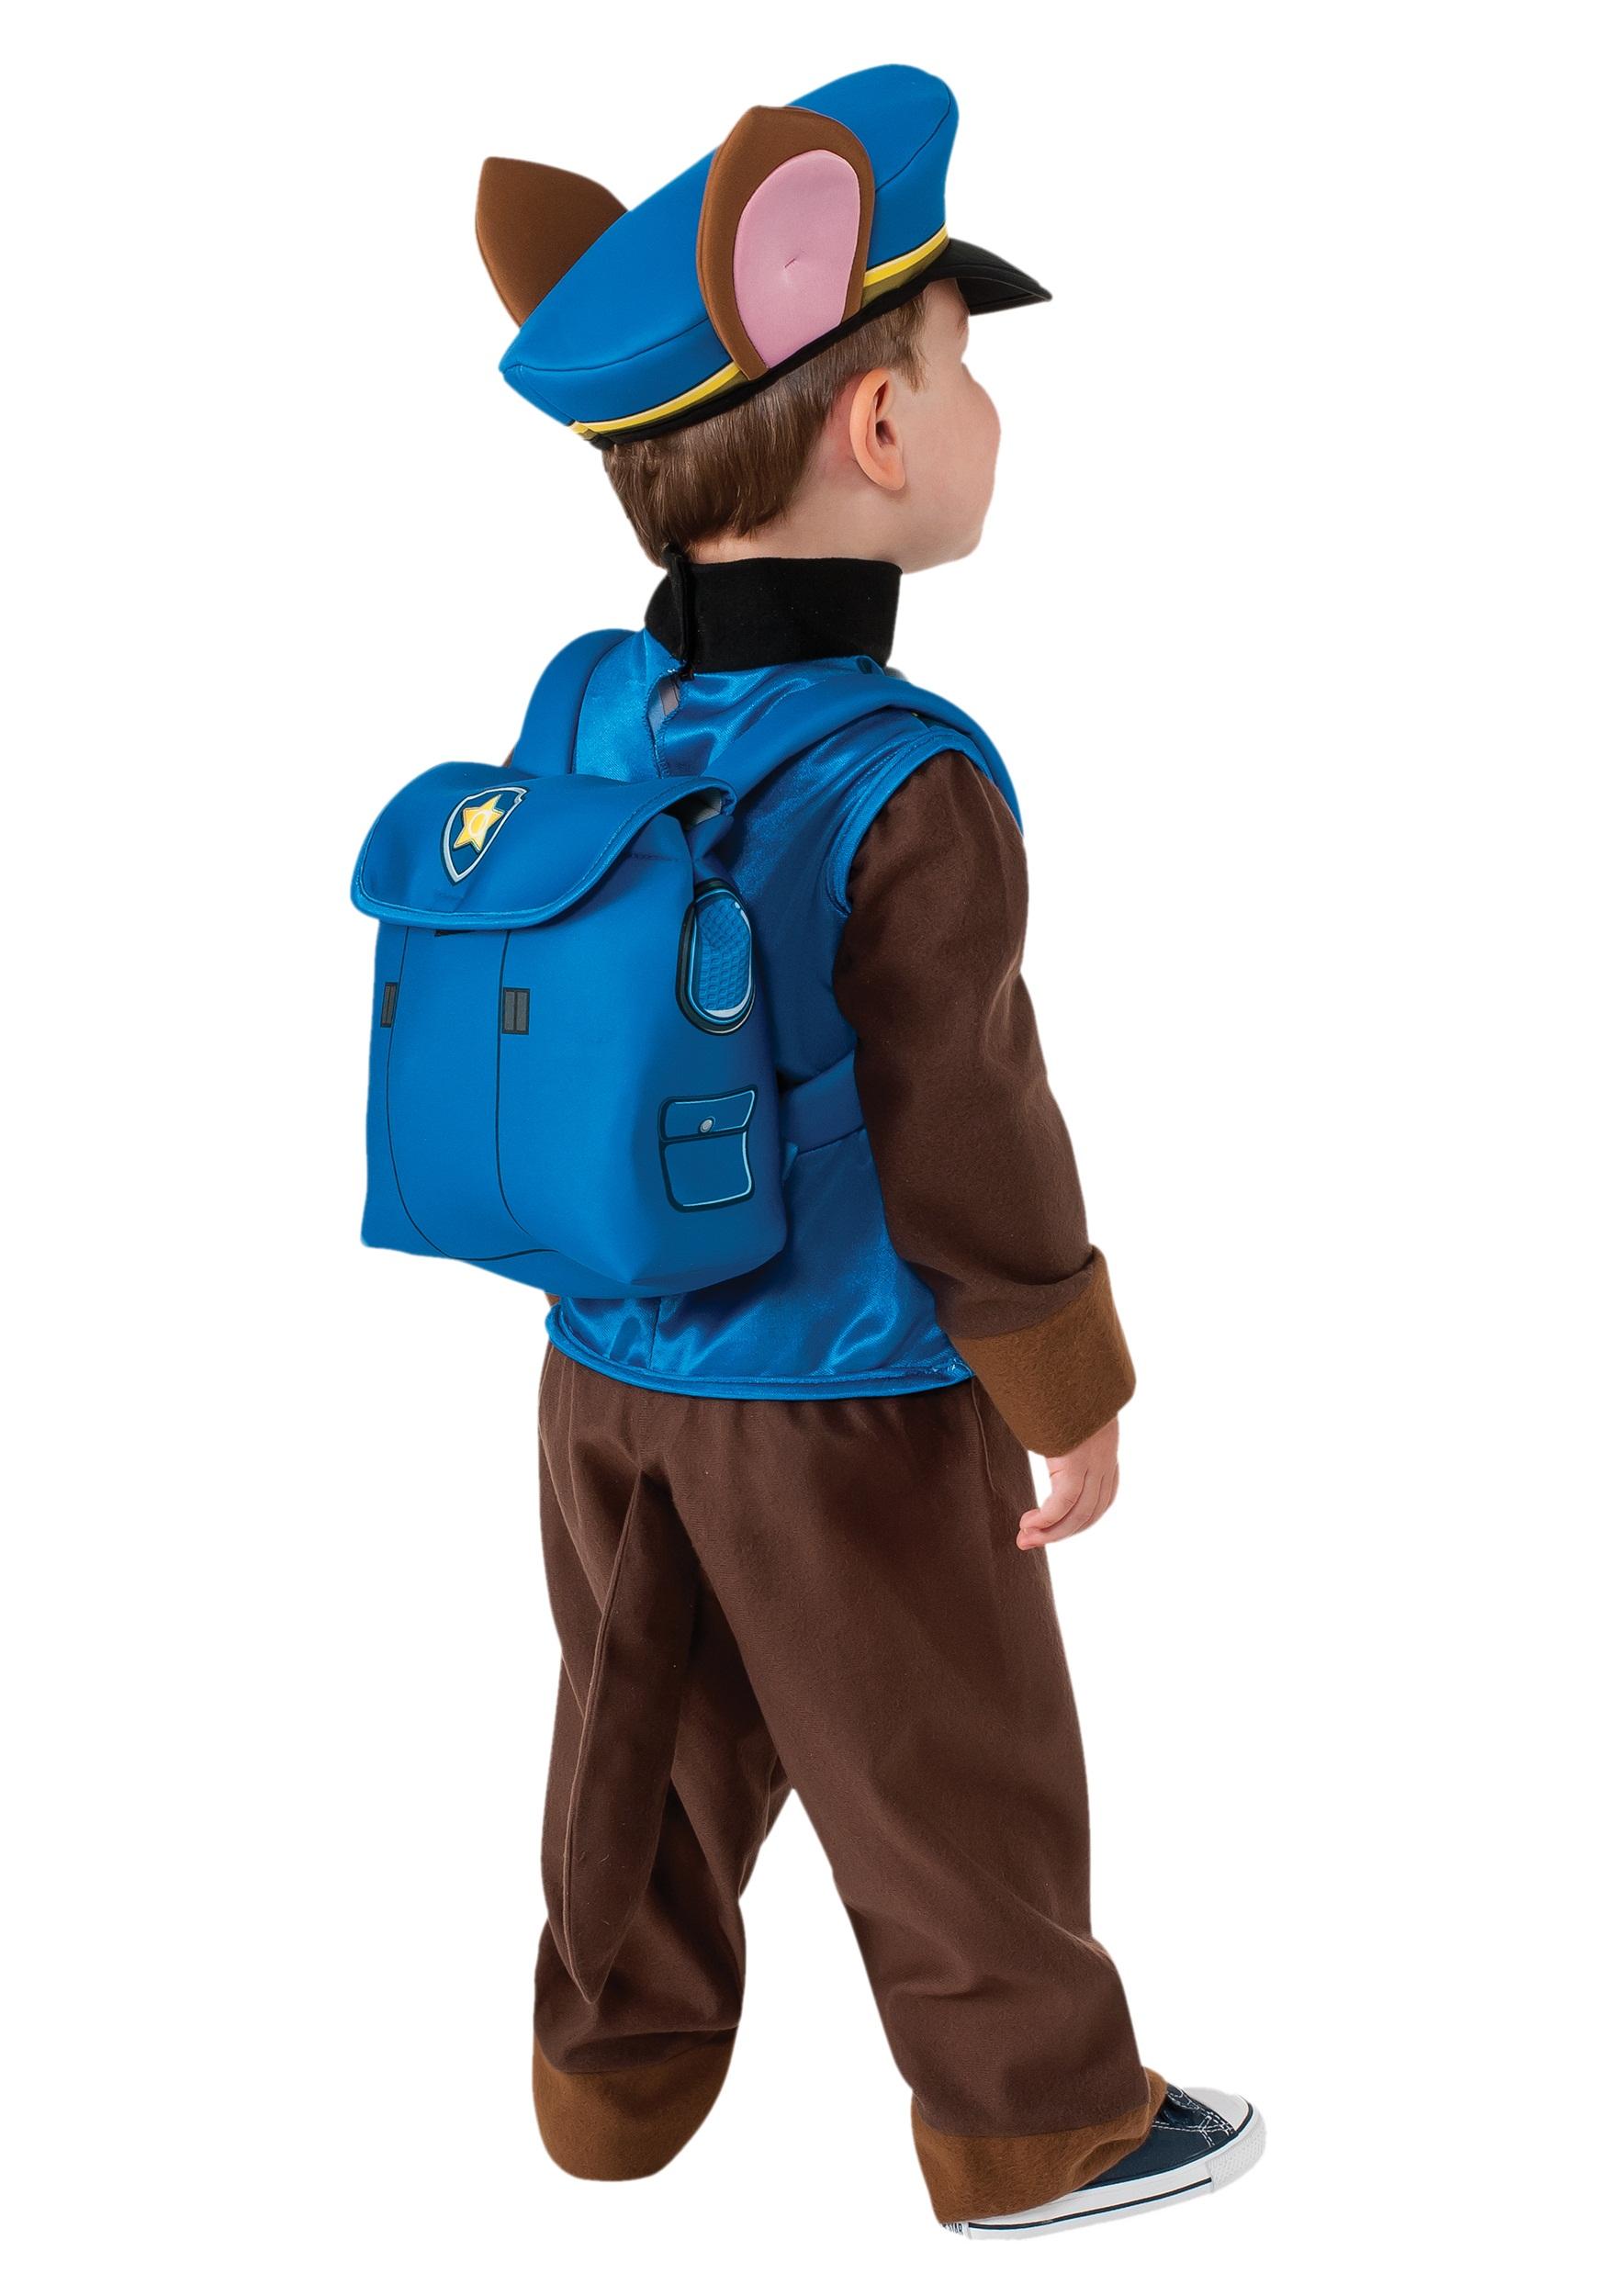 Paw patrol chase child costume alt1